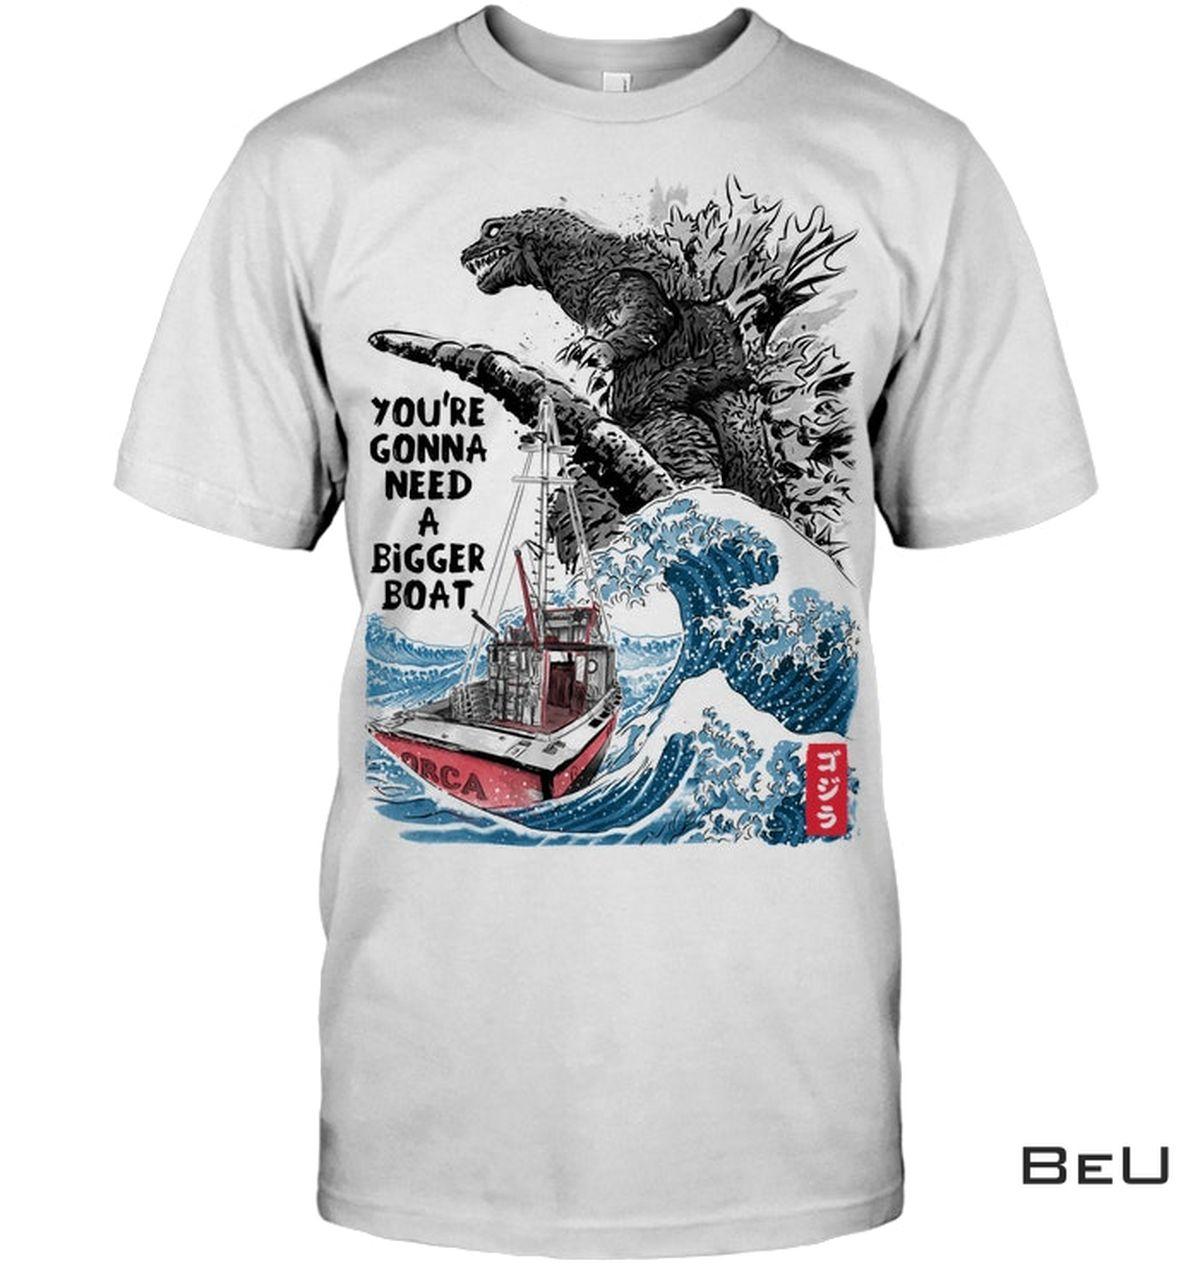 You're Gonna Need A Bigger Boat Godzilla Shirt, hoodie, tank top